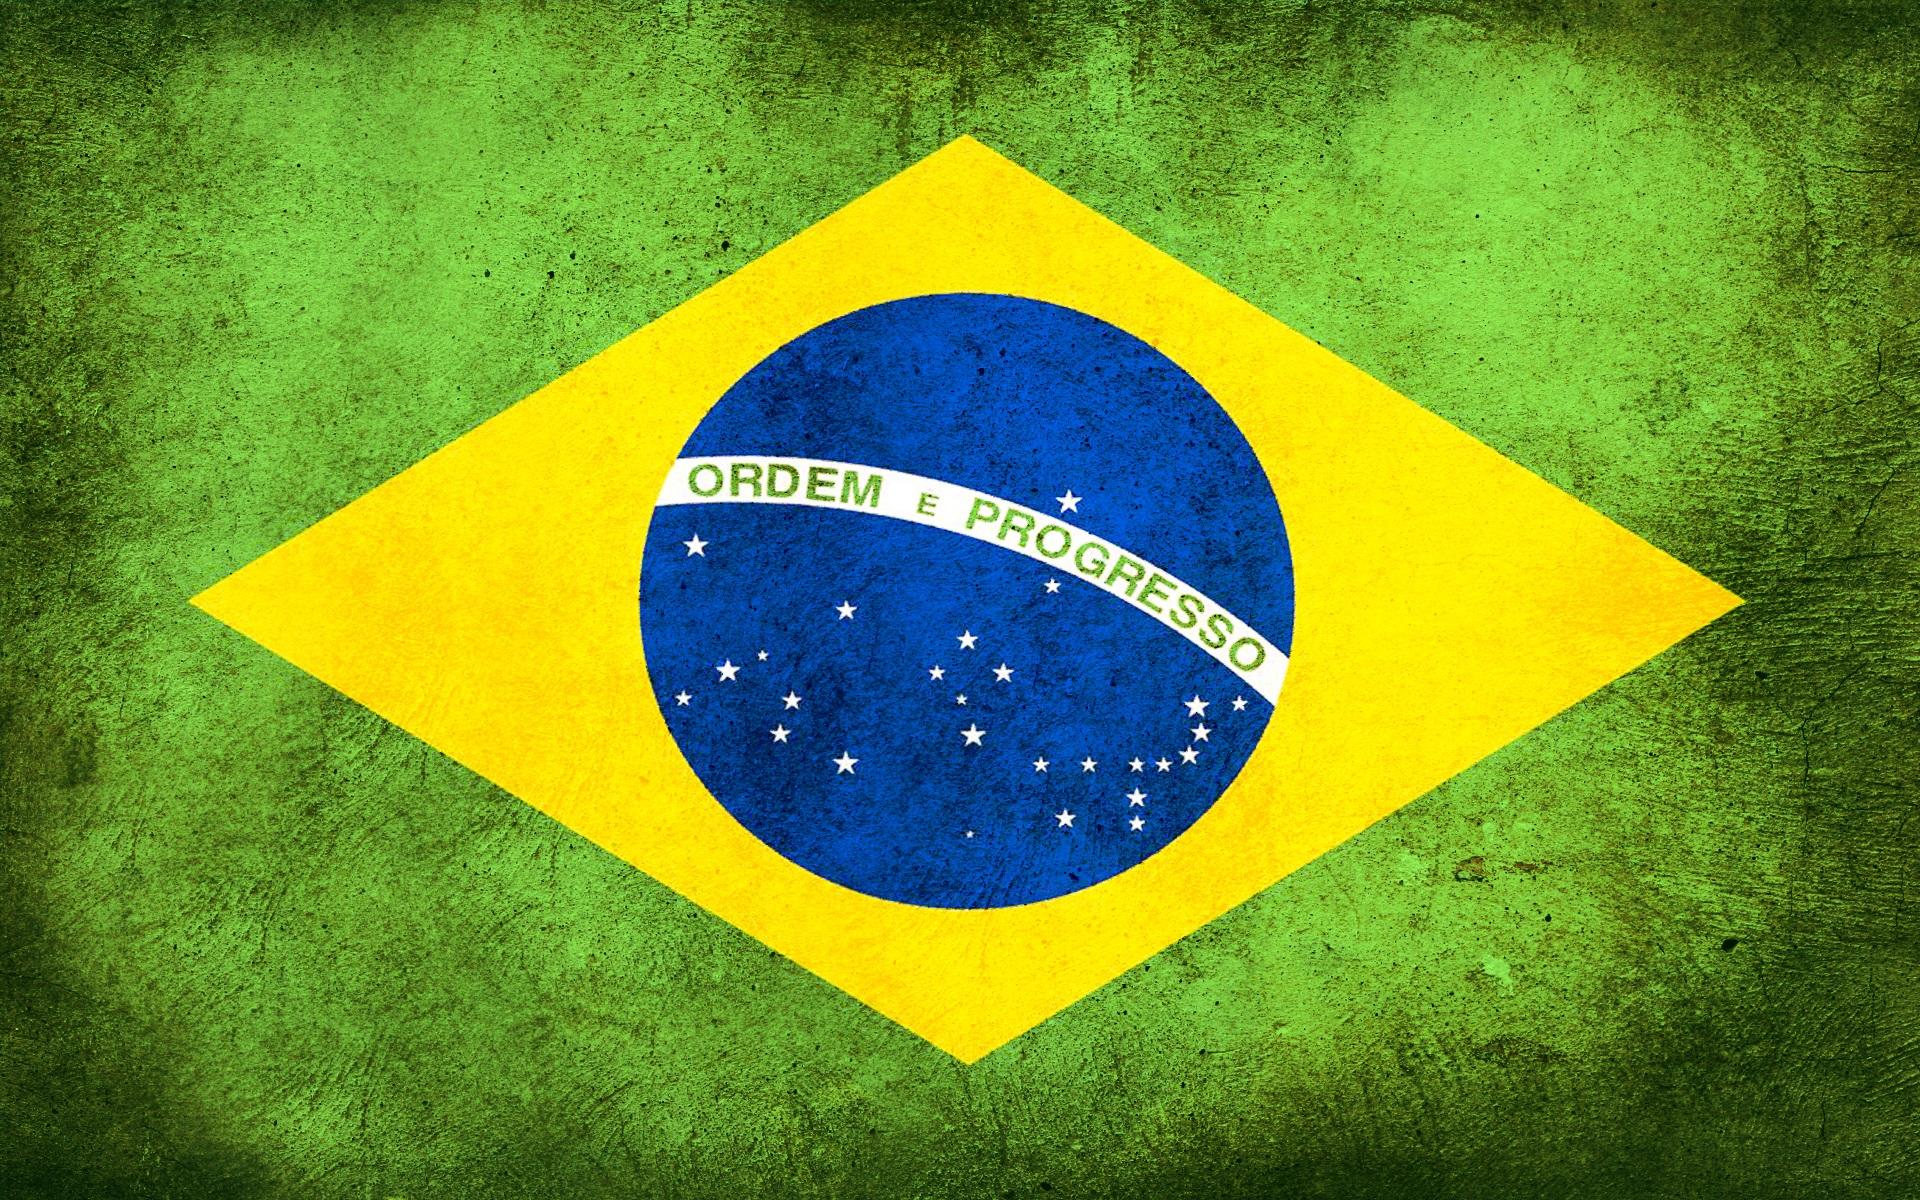 Papéis De Parede Bandeira Do Brasil 1920x1200 HD Imagem